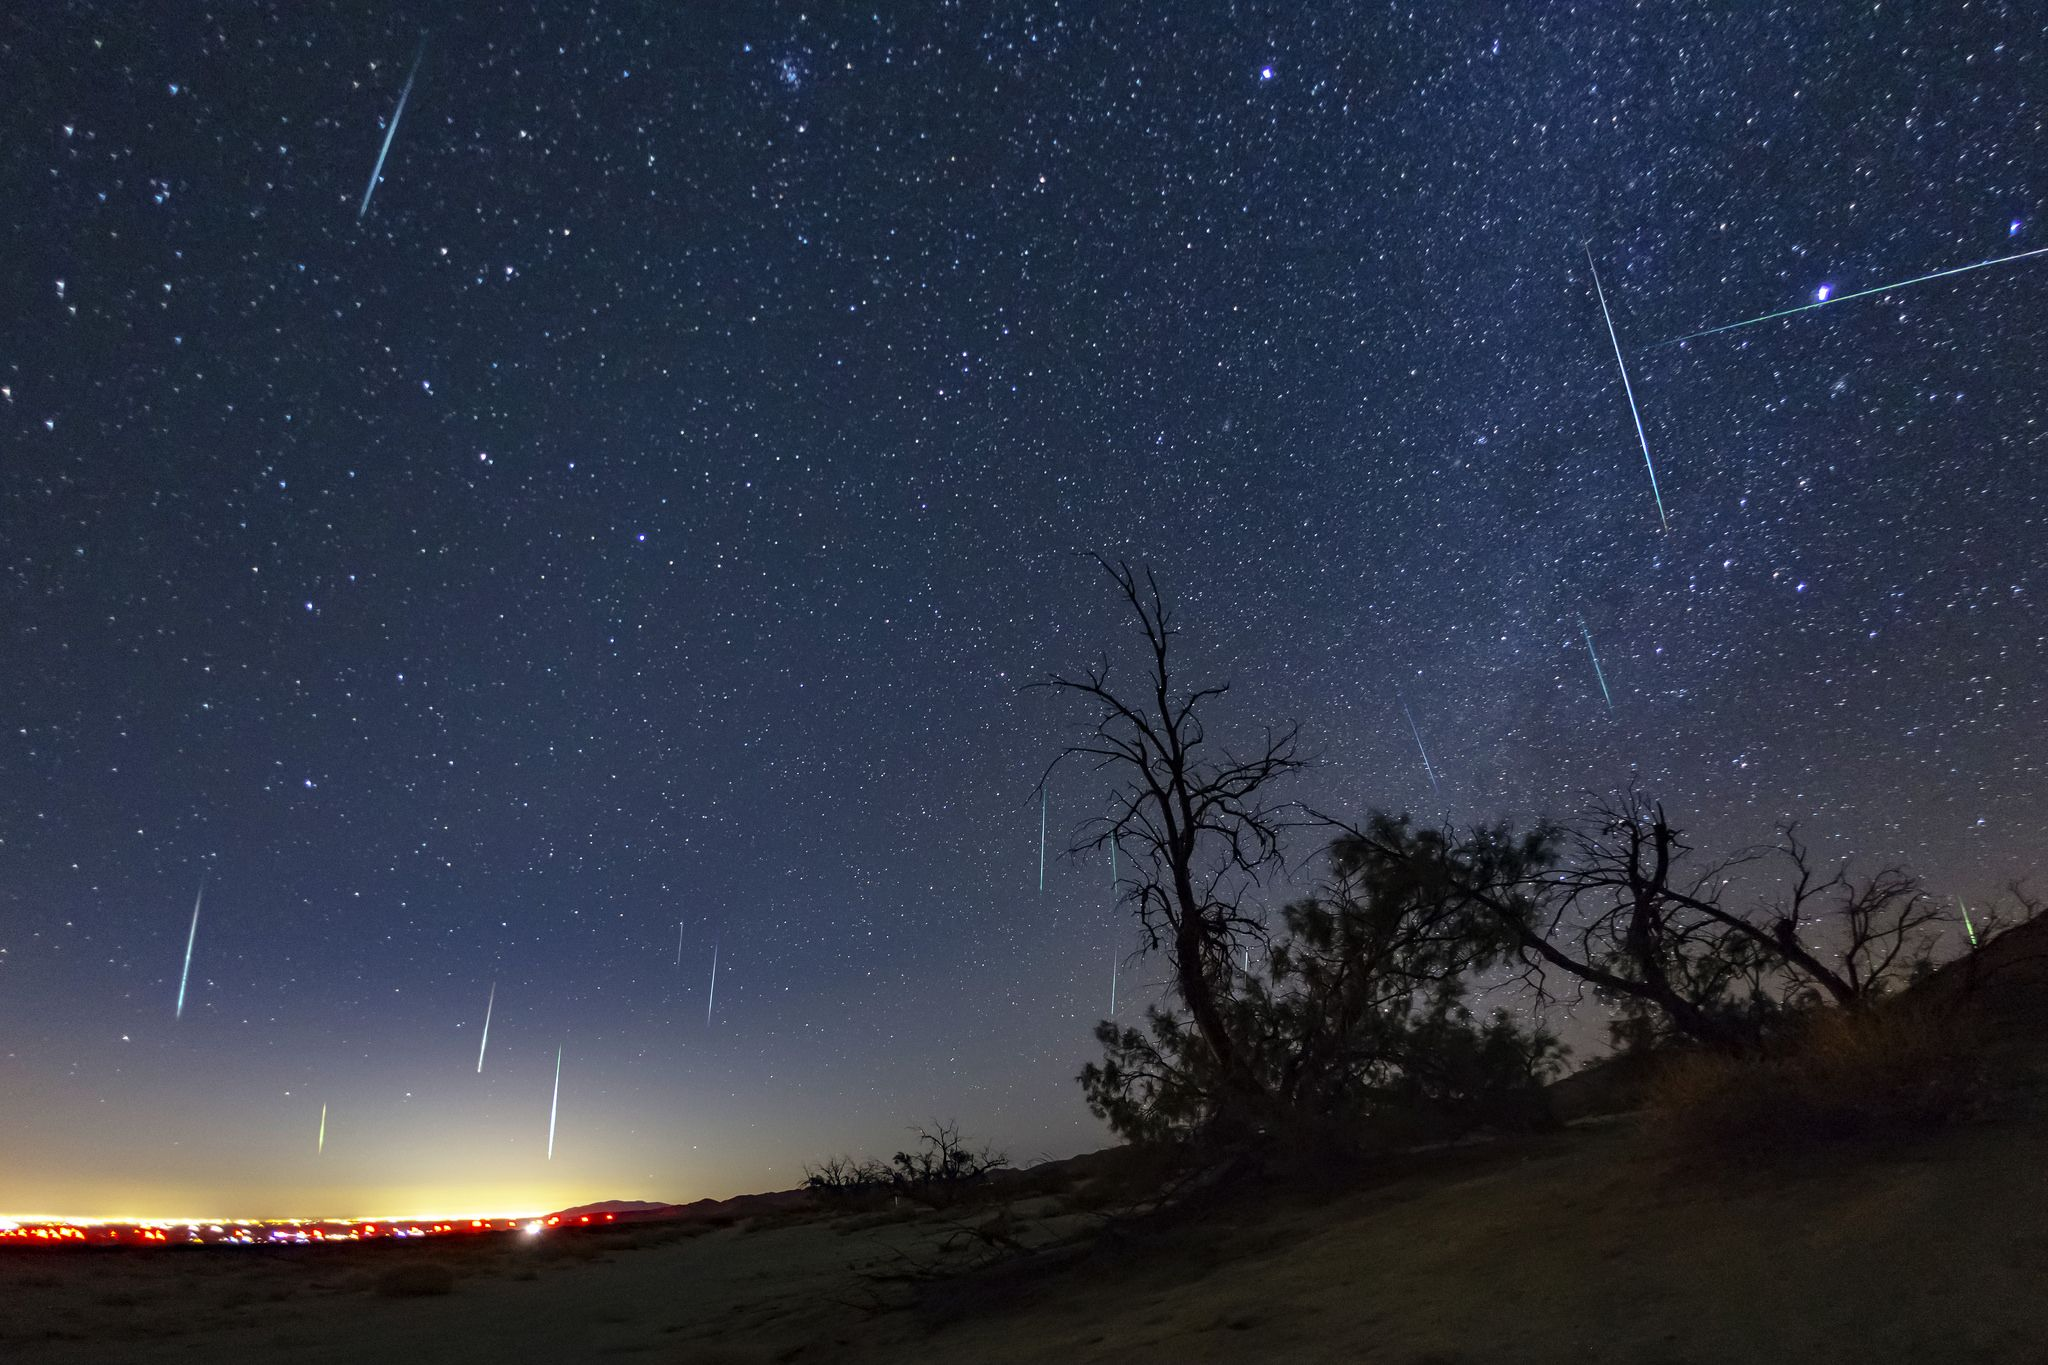 Geminid Meteor Shower 2017 Over El Centro From Dos Cabezas